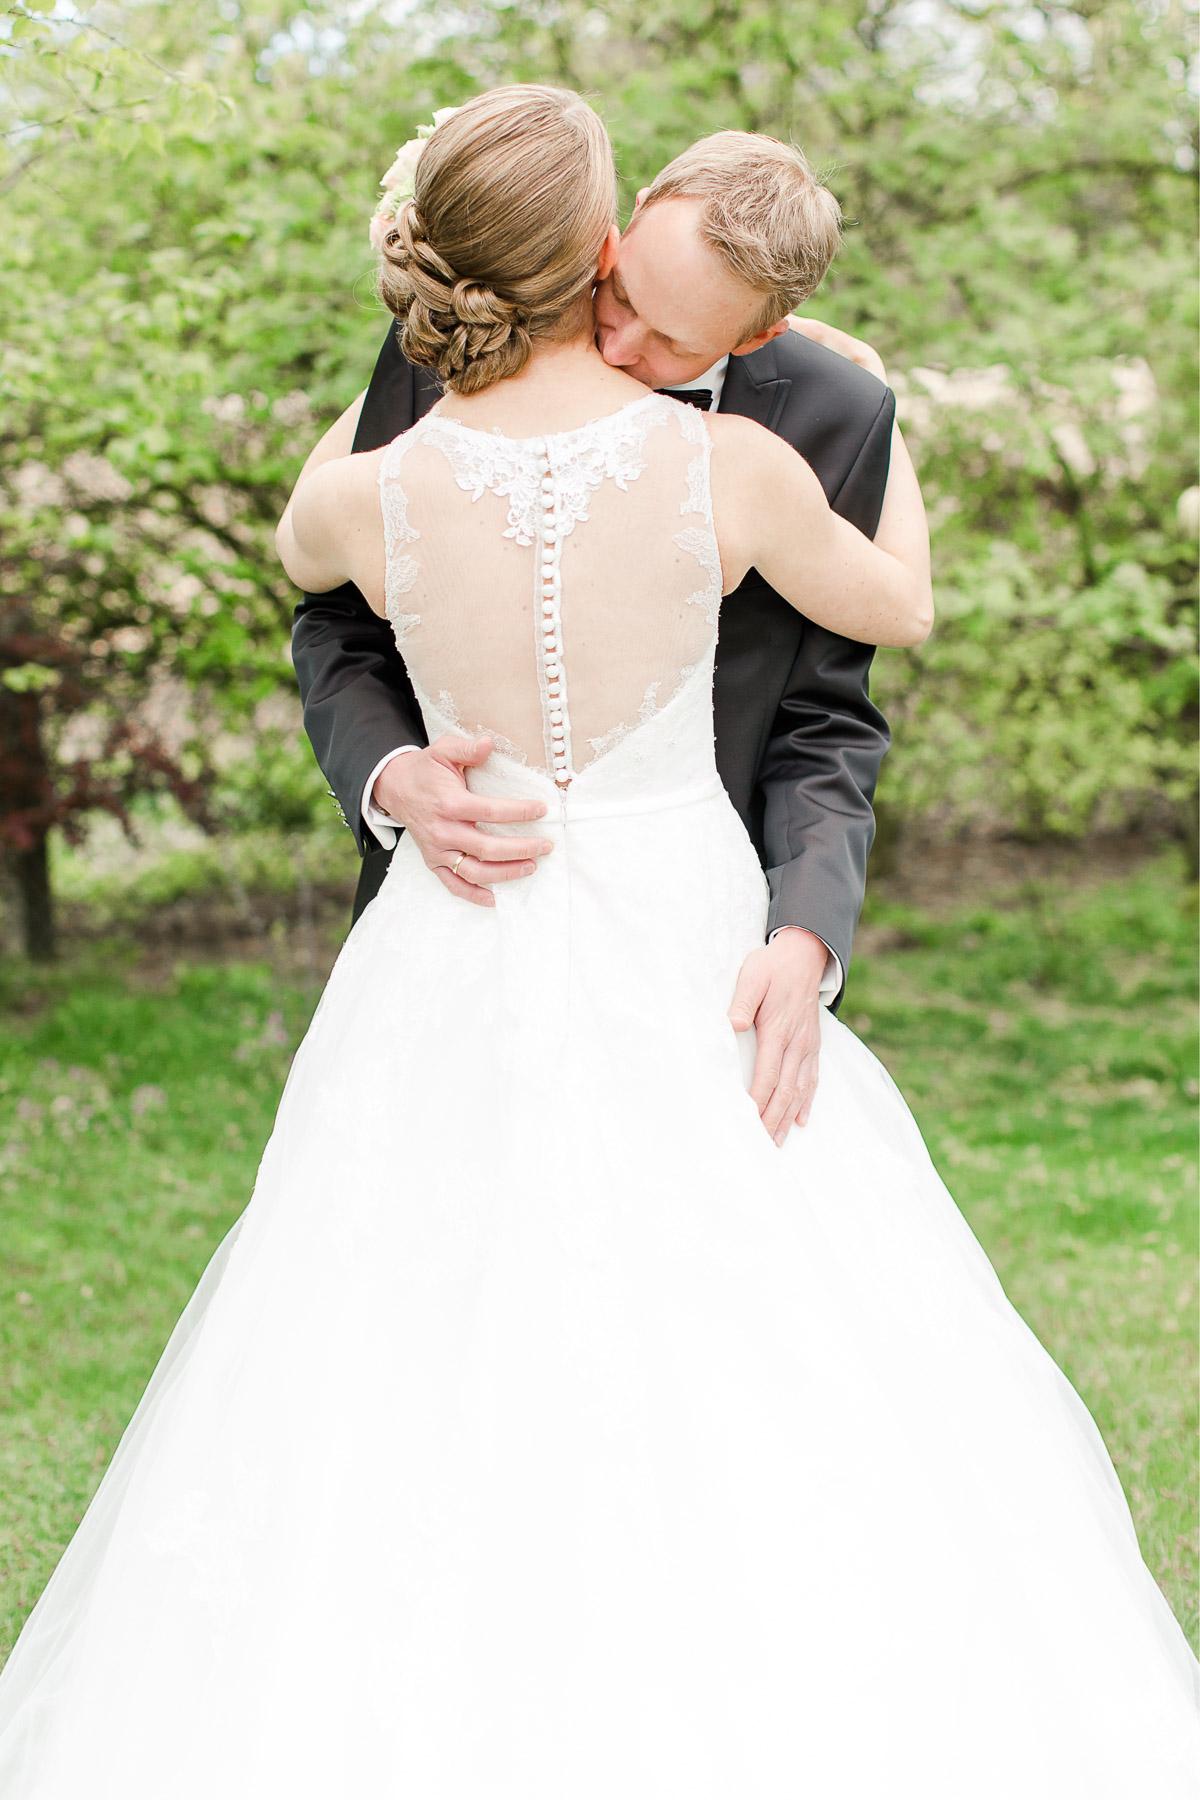 Hochzeitsfotograf-Bielefeld-2016-04-23021